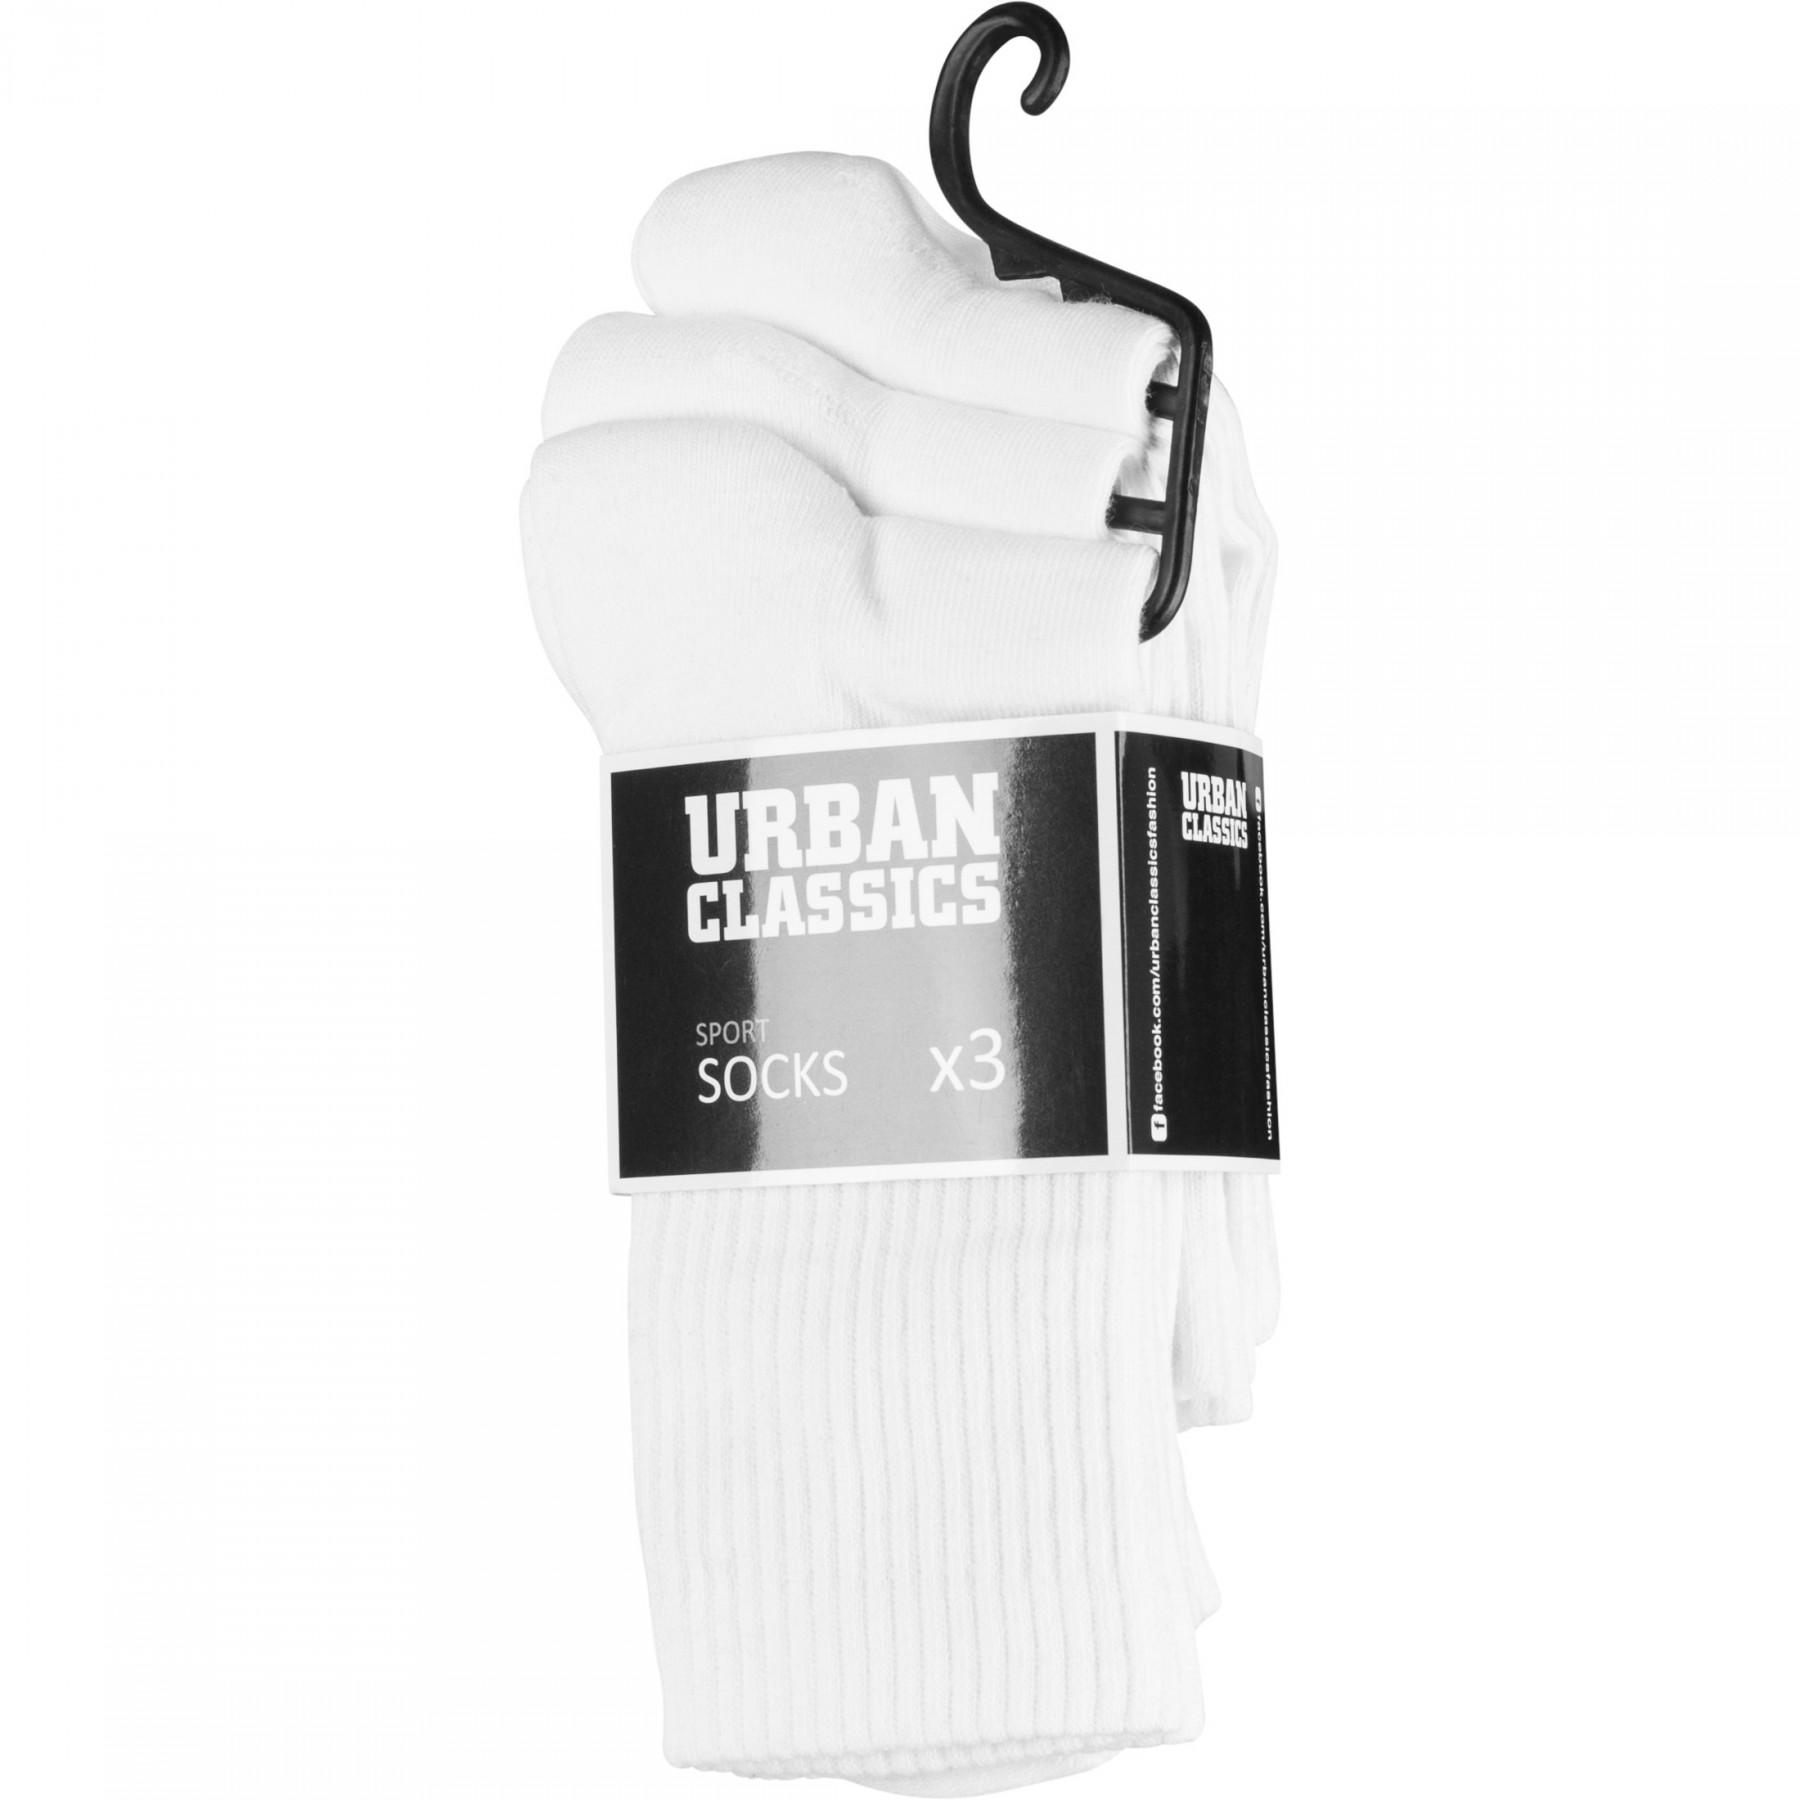 Pack of 3 Urban Classic Sport Socks